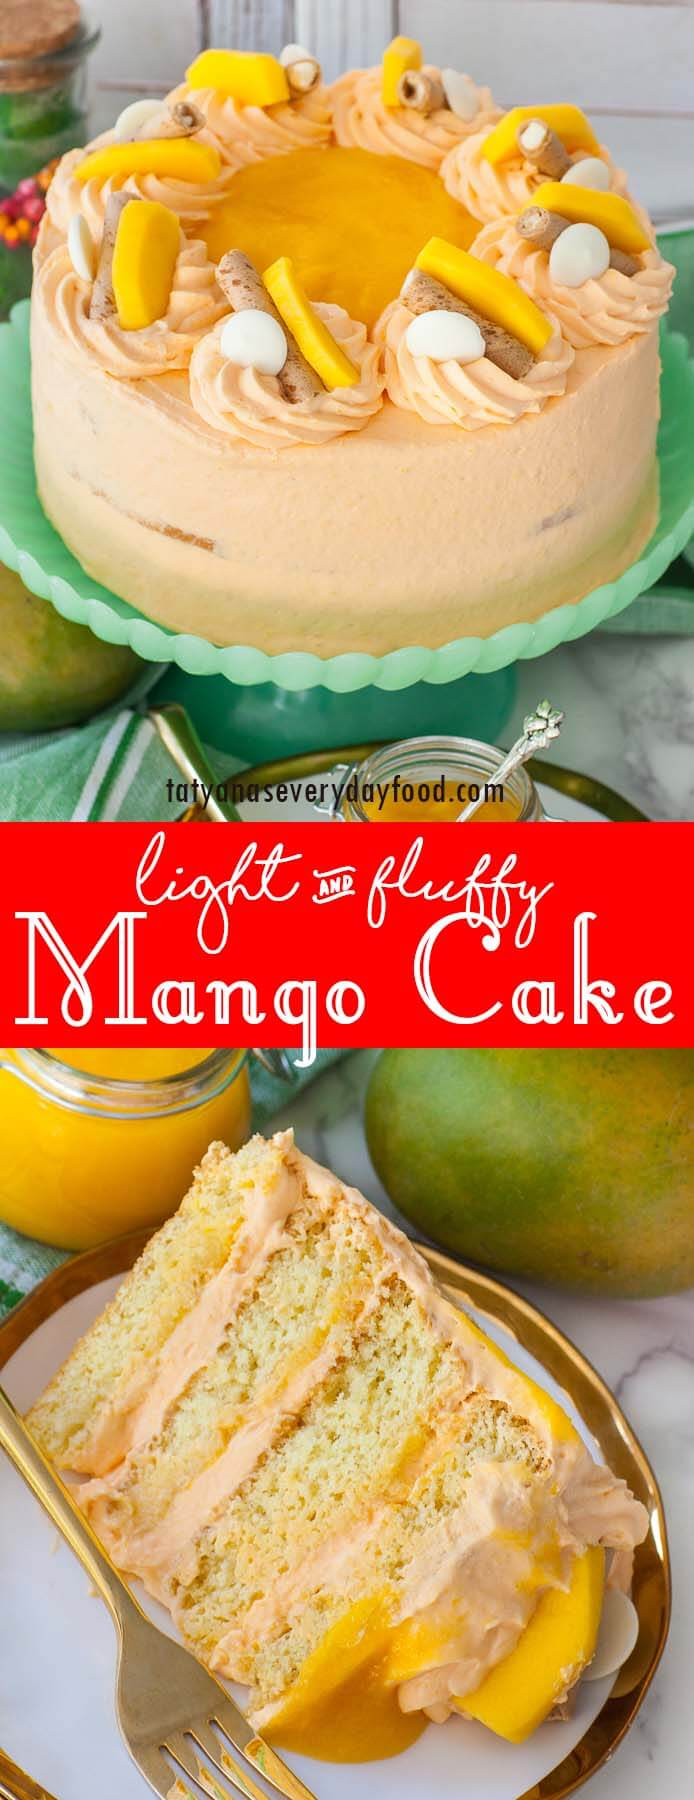 Mango Cake video recipe